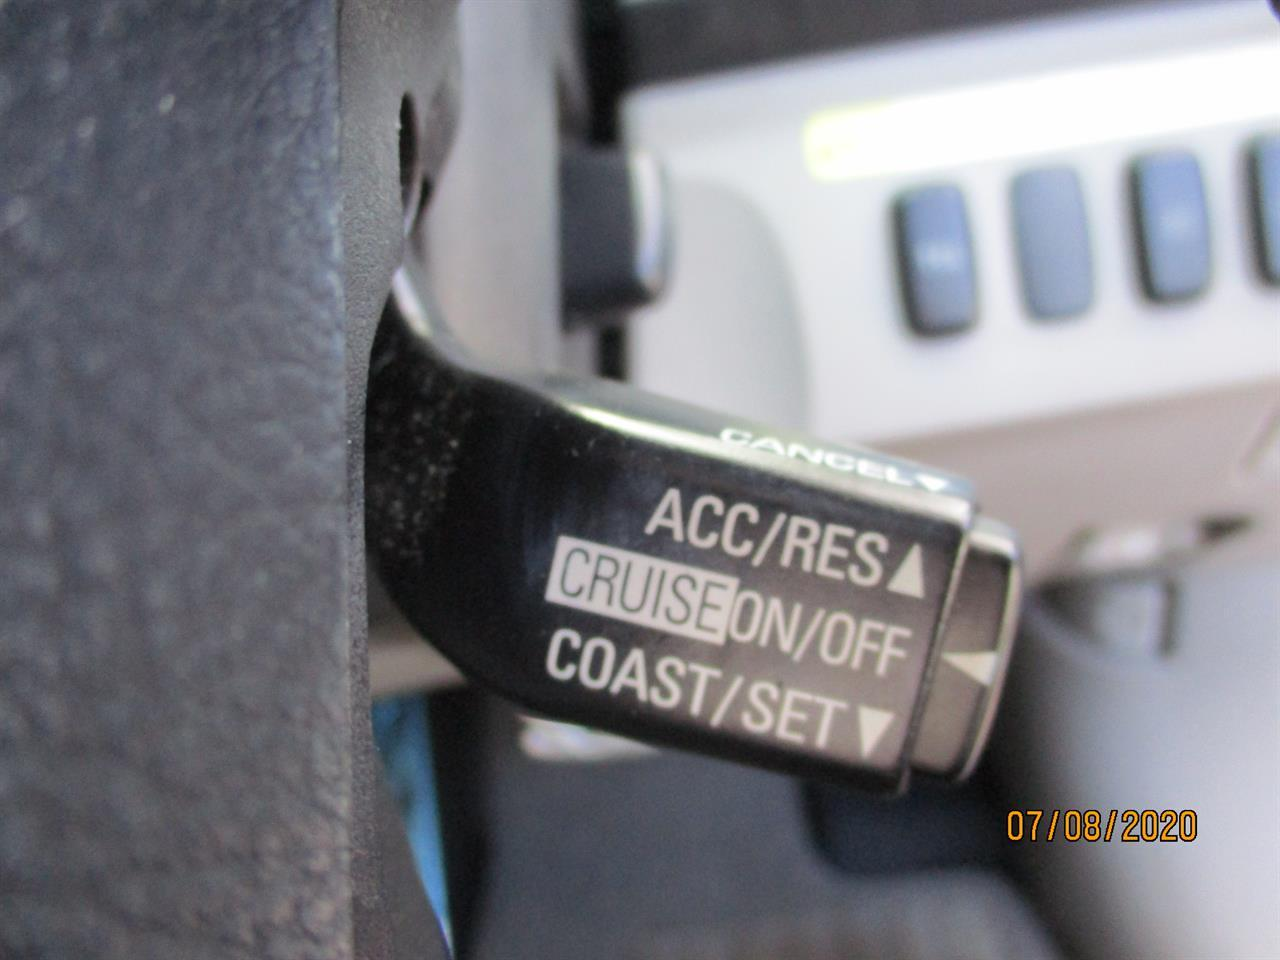 image-10, 2007 Mitsubishi Grandis 2.4 7 seater at Dunedin